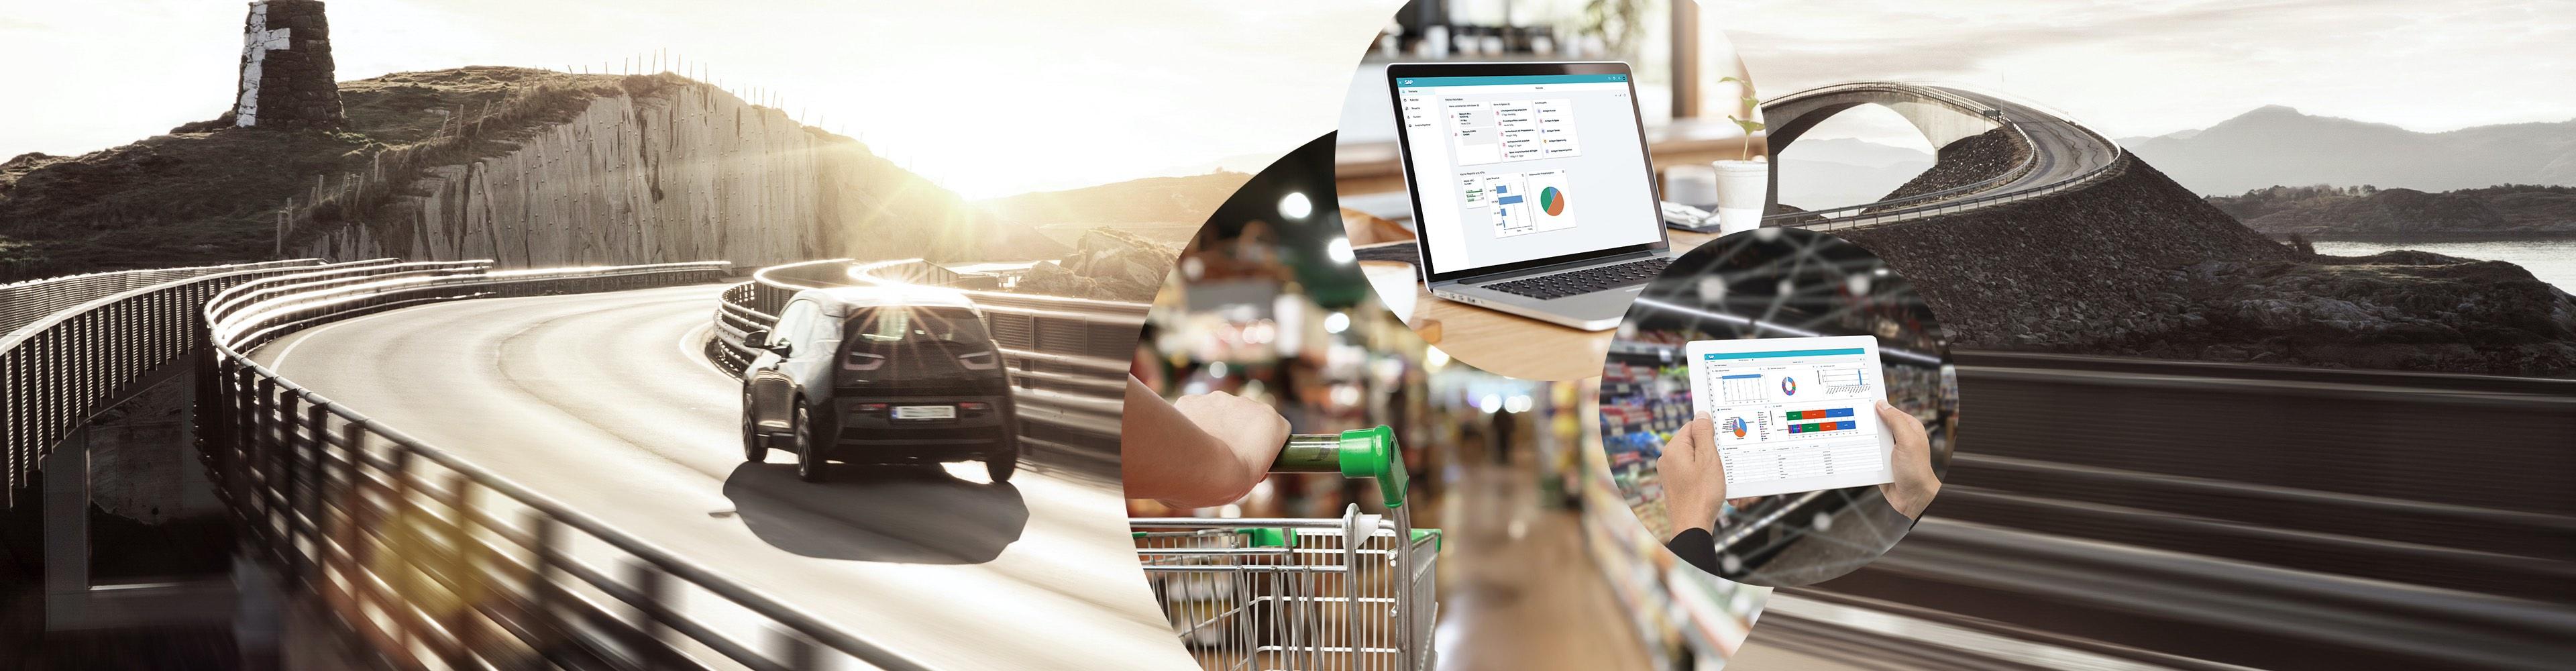 Dreiklang-Retail-Execution-Querformat-k